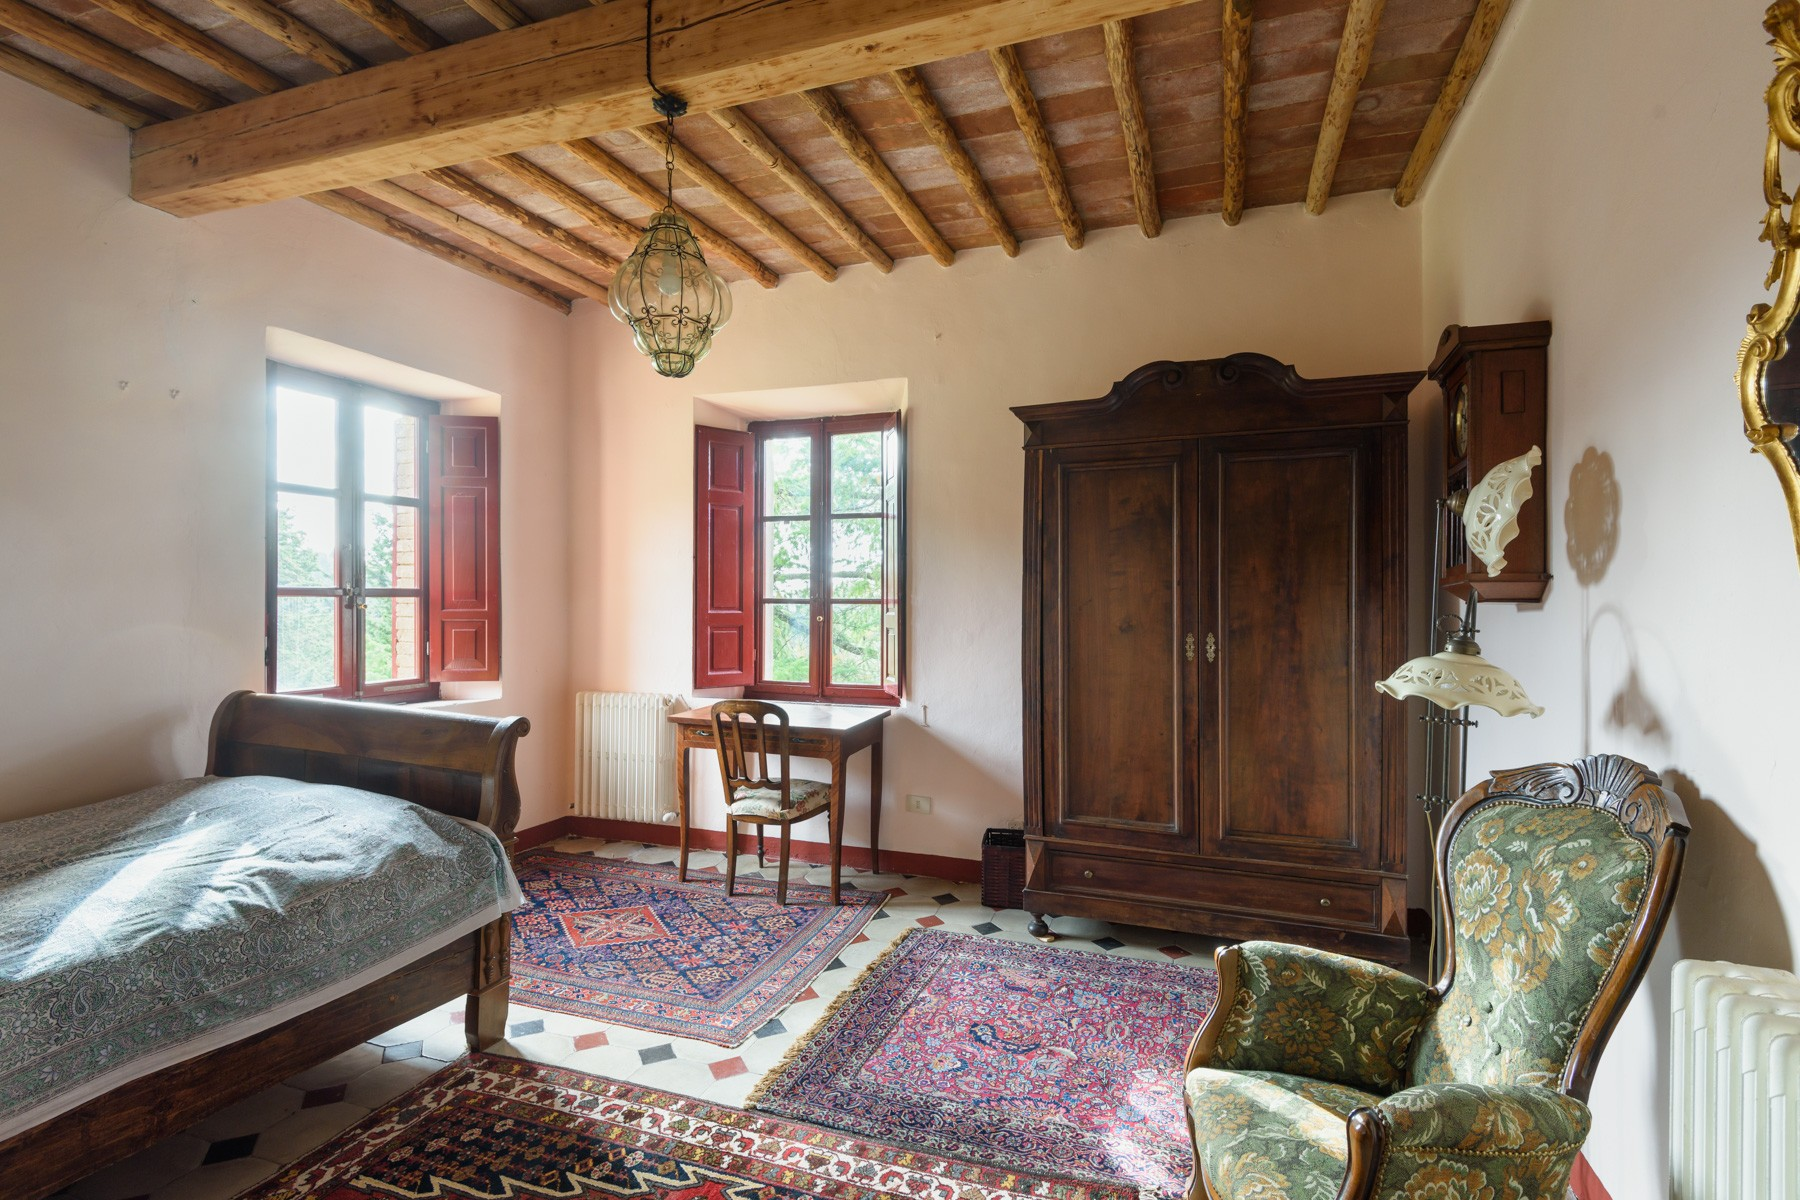 Additional photo for property listing at Unique property in the heart of Chianti Le Pici Castelnuovo Berardenga, Siena 53019 Italia